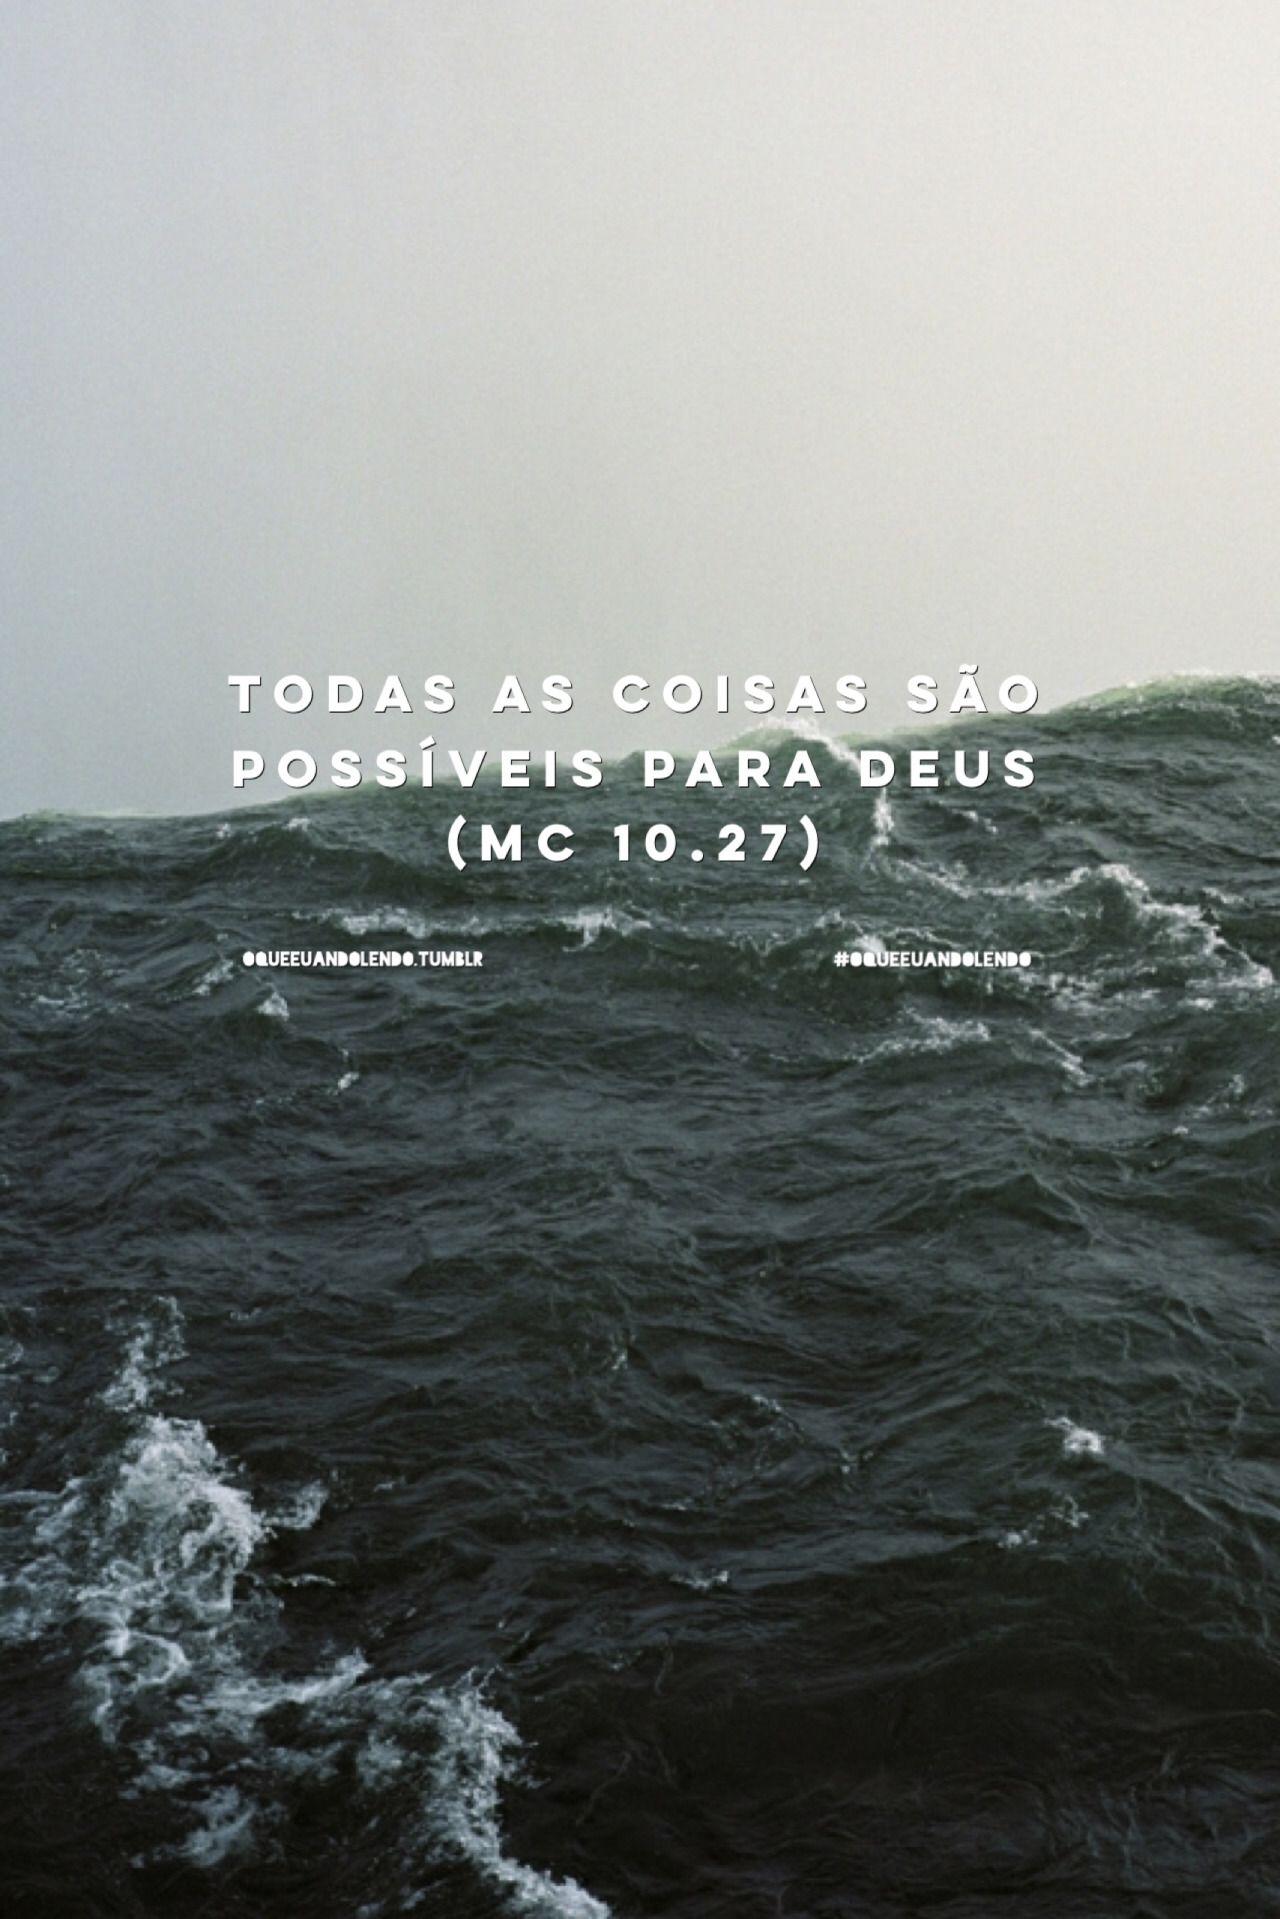 Frases De Deus Para Capa De Facebook Tumblr Social Media La